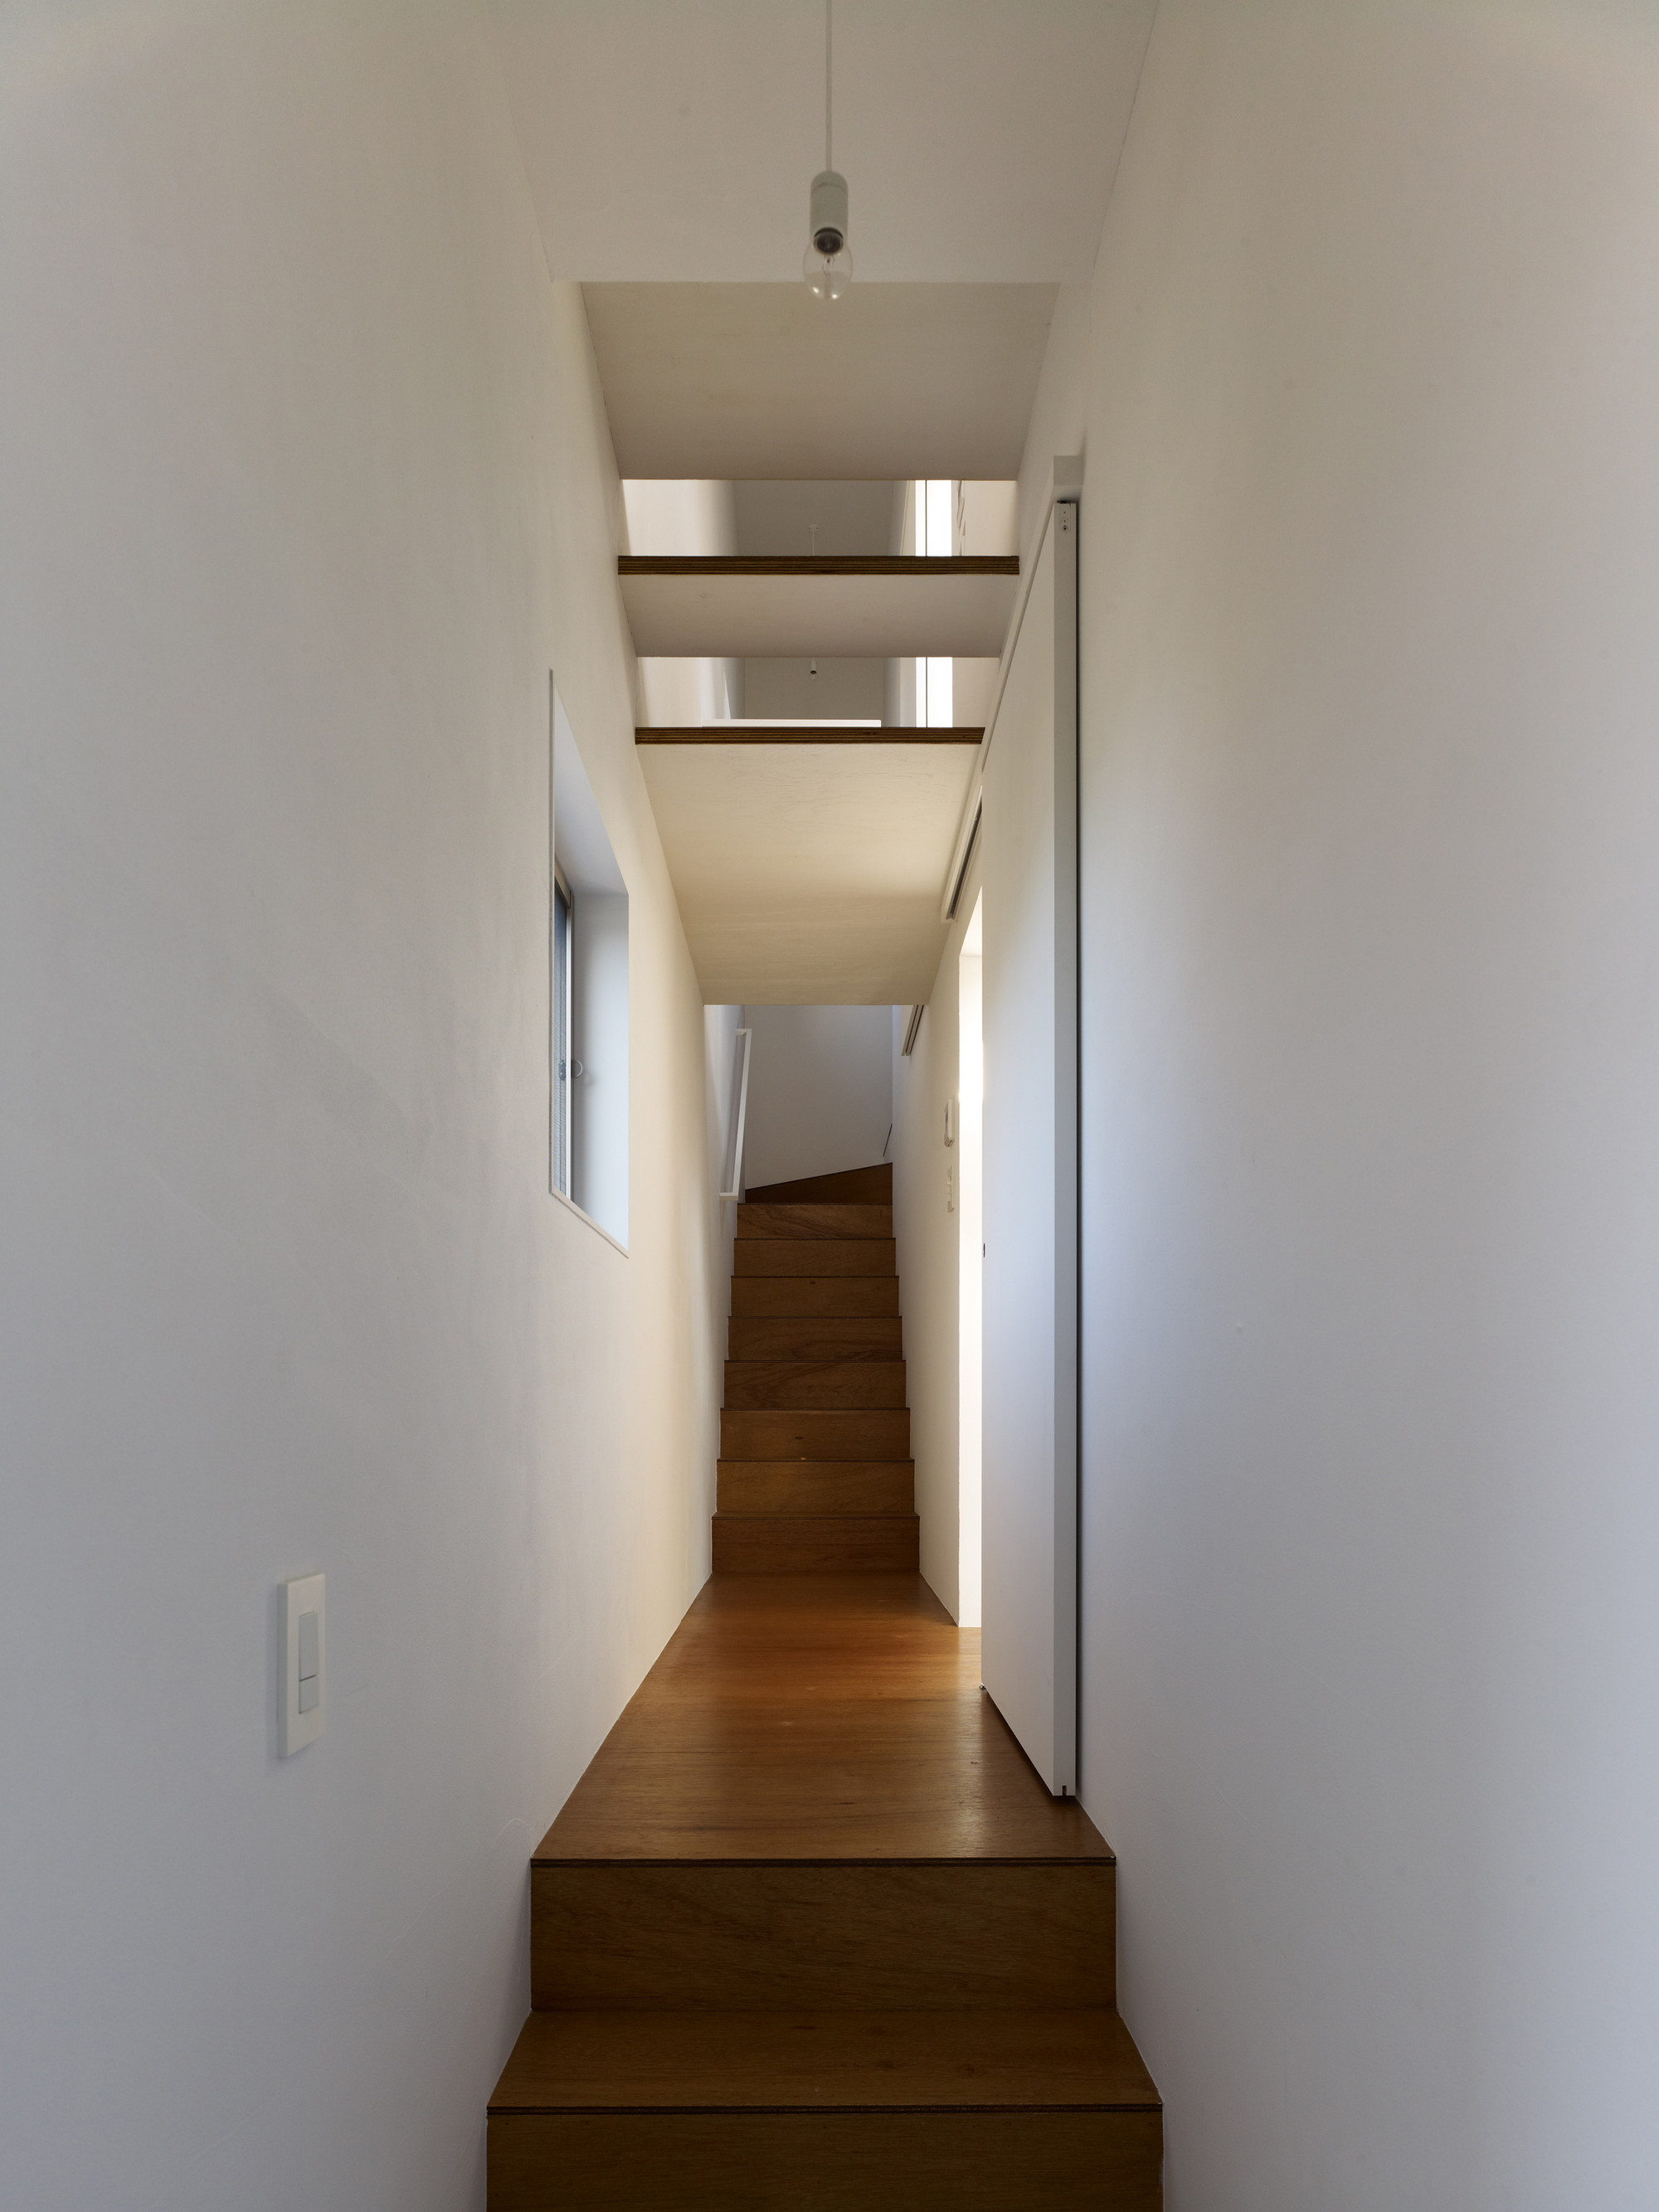 Gallery of amida house kochi architect 39 s studio 10 for Amida house istanbul